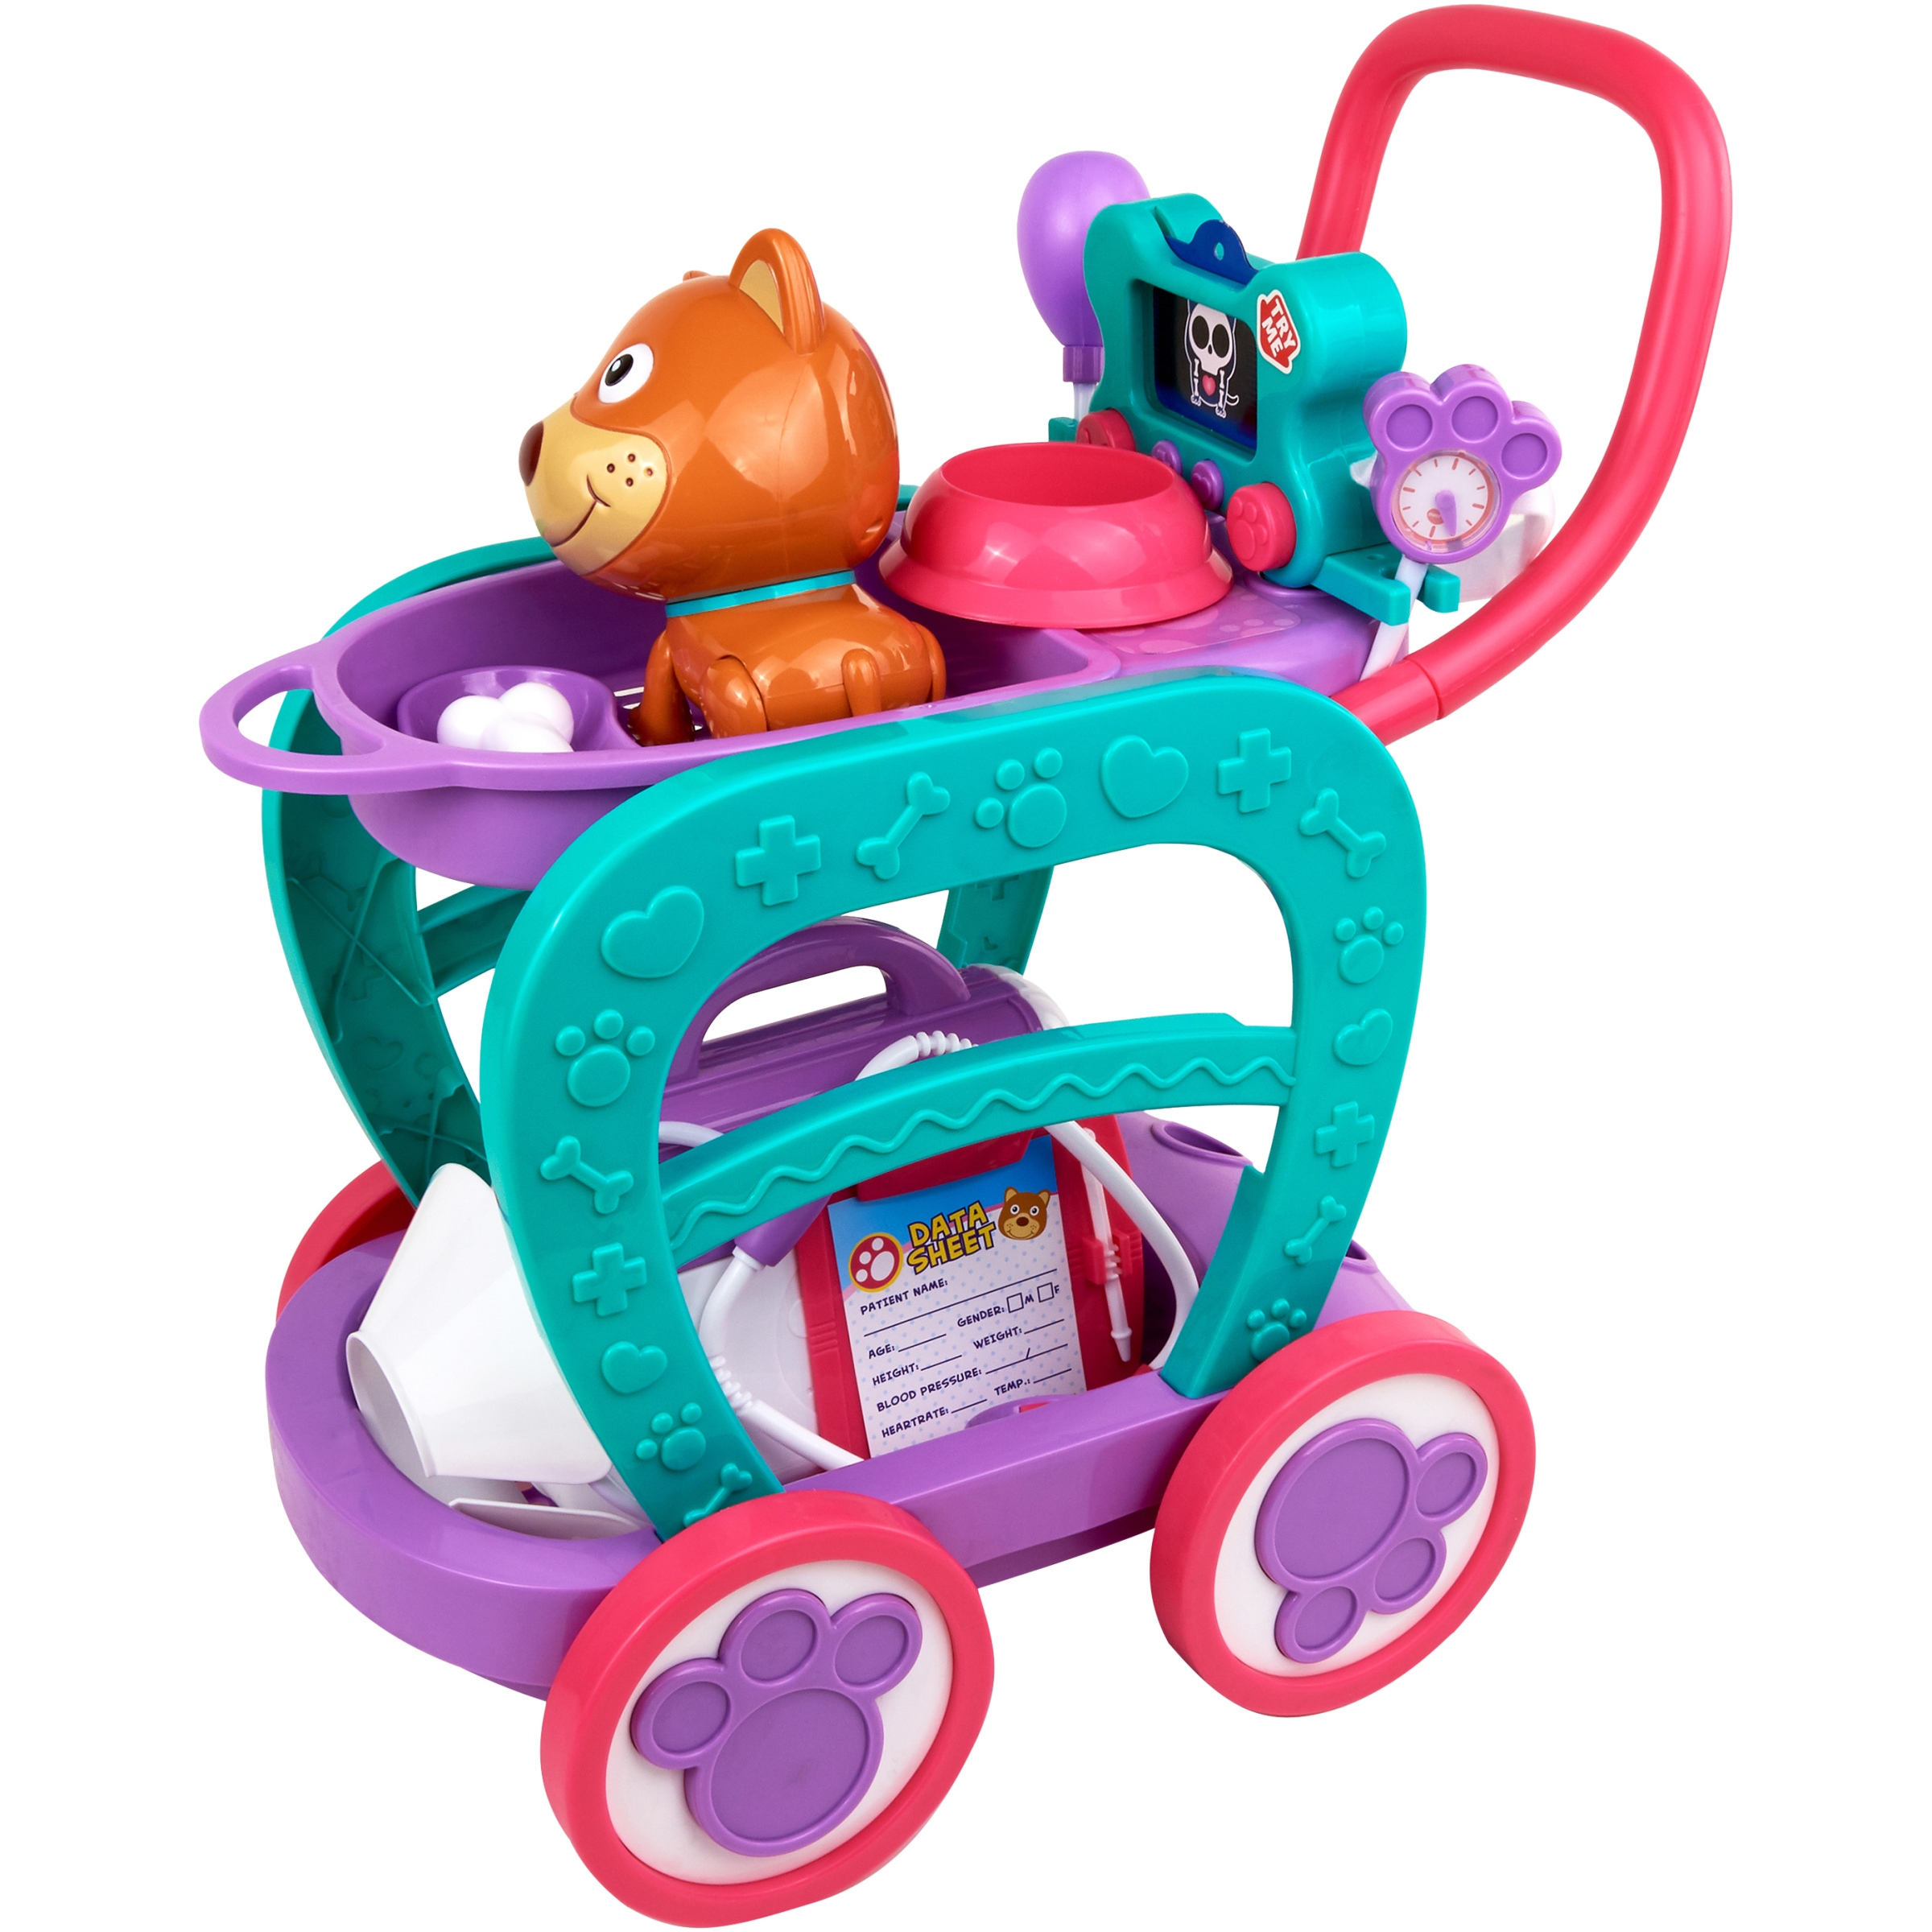 Kid Connection 24-Piece Light & Sound Veterinarian Cart Play Set